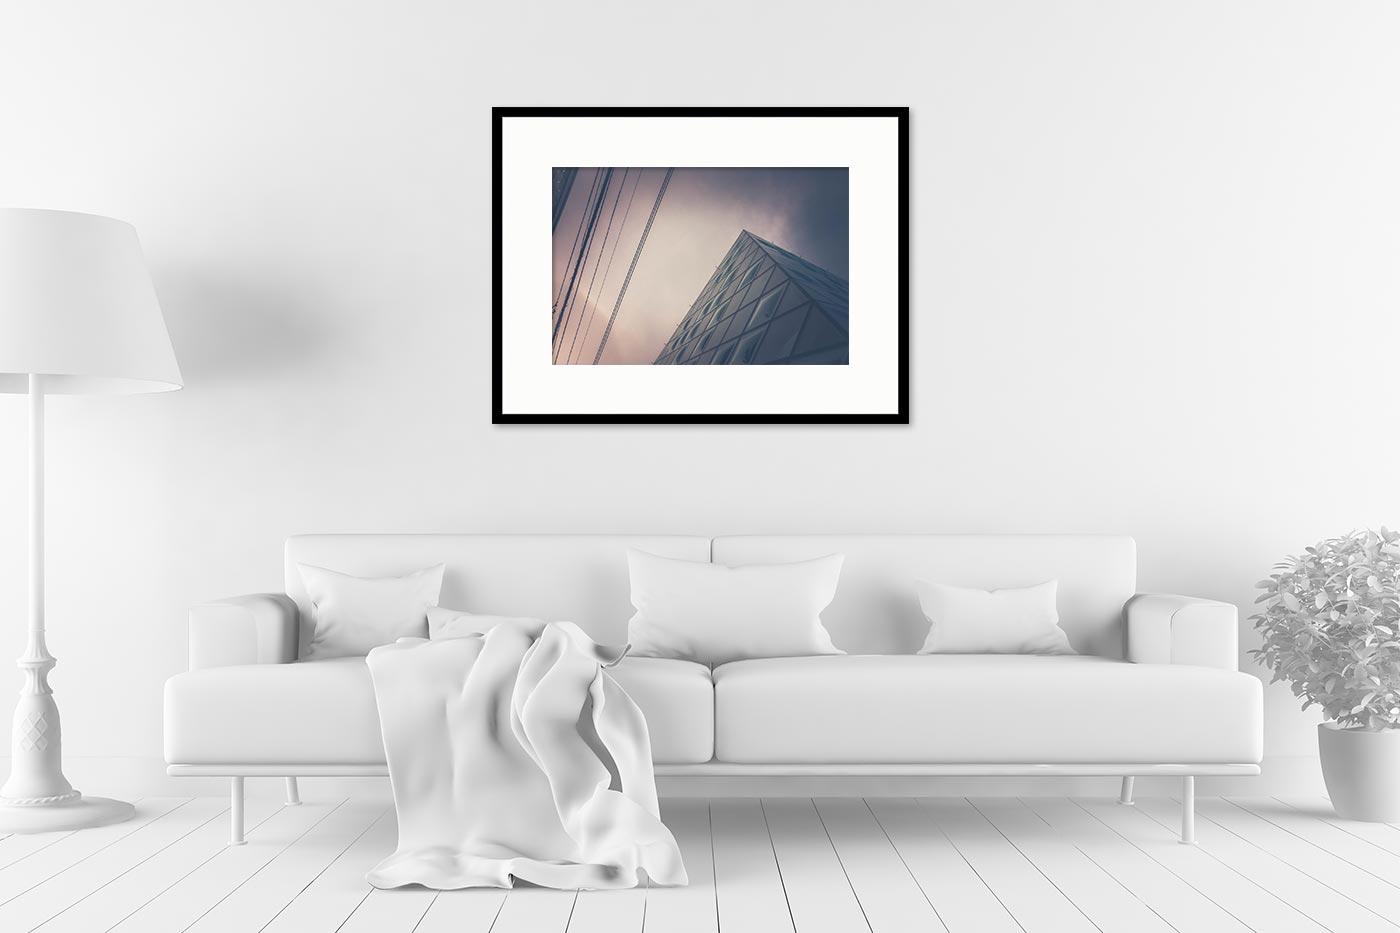 Cadre galerie 60x80 Hype